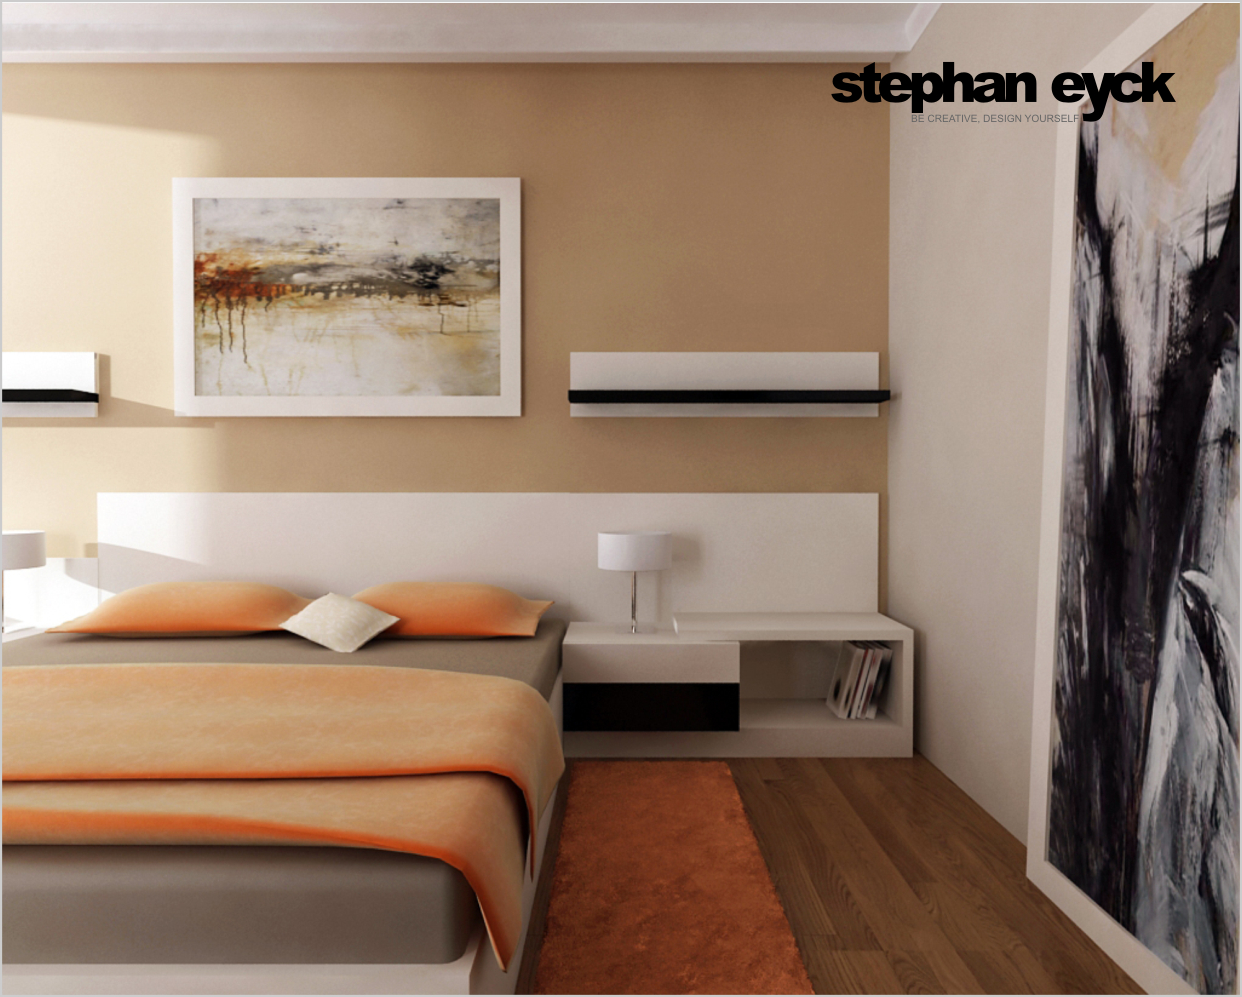 Dizain interior joy studio design gallery best design - Home dizain interior ...